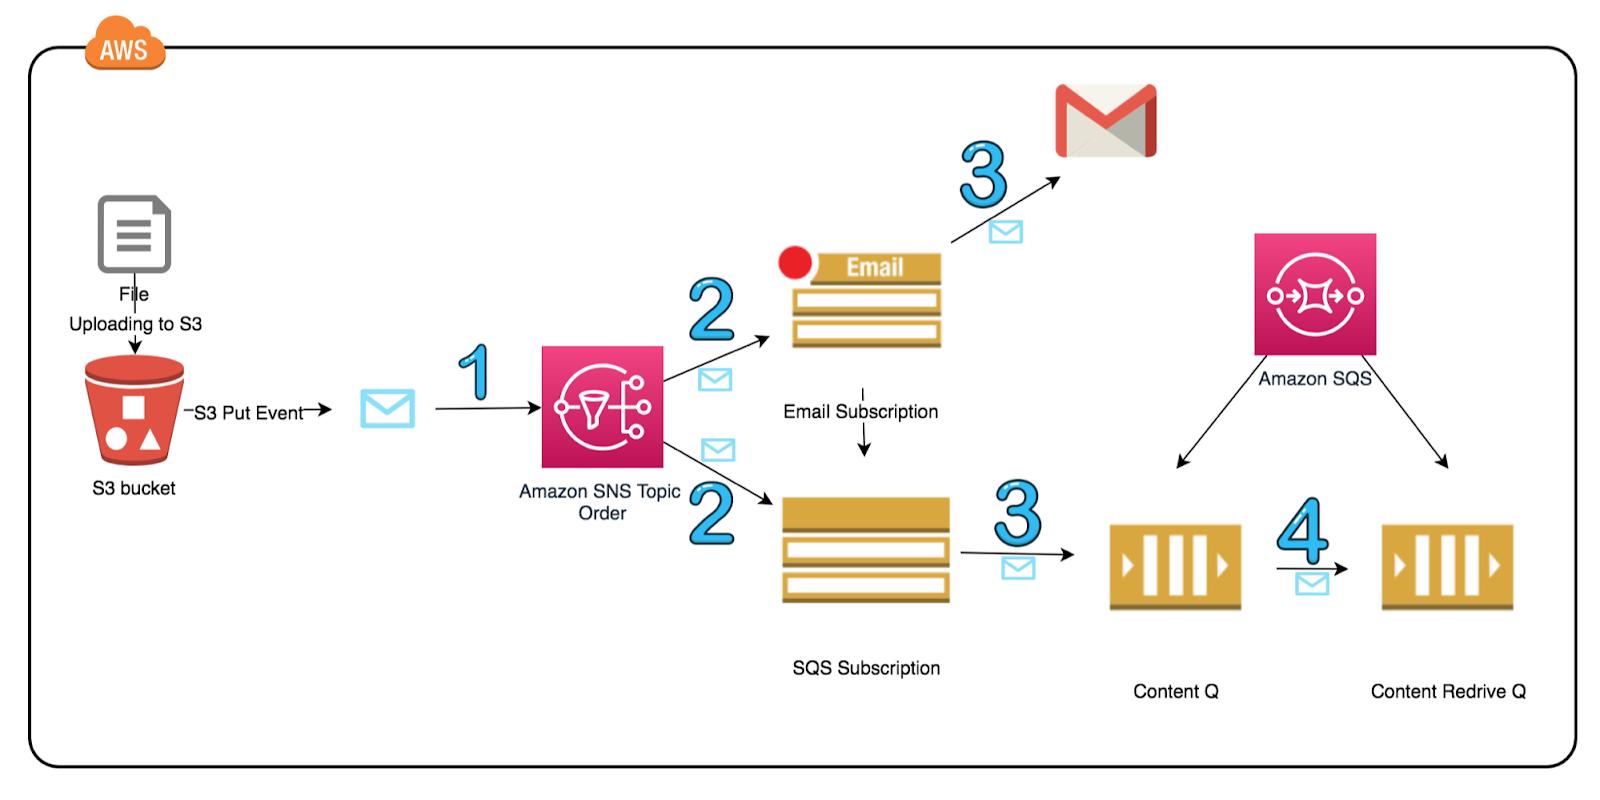 Blog on DevOps, Cloud Computing, SCM: Amazon SNS & SQS Simplified